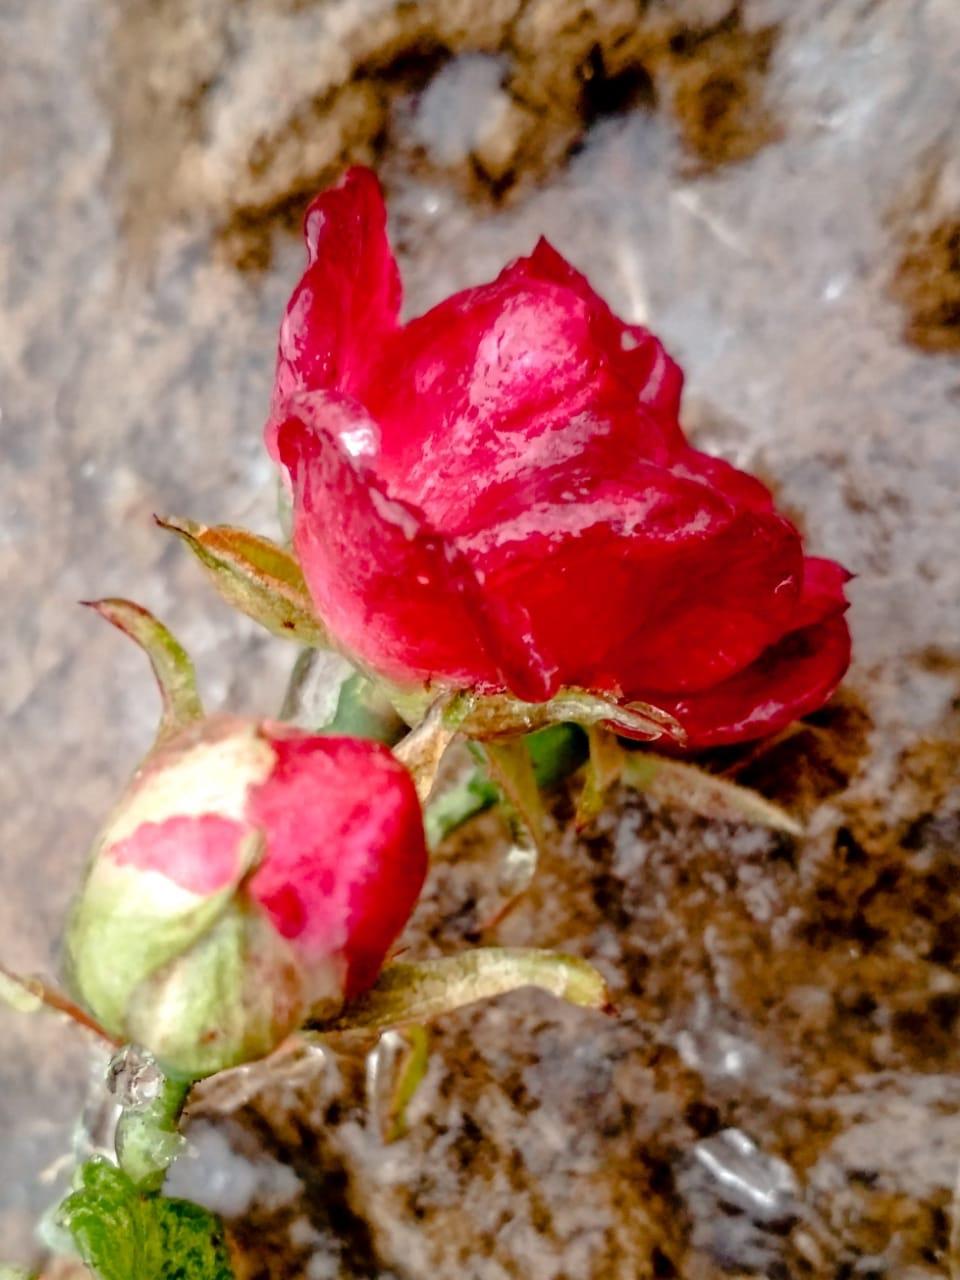 Вчерашняя Роза, которая с мороза.